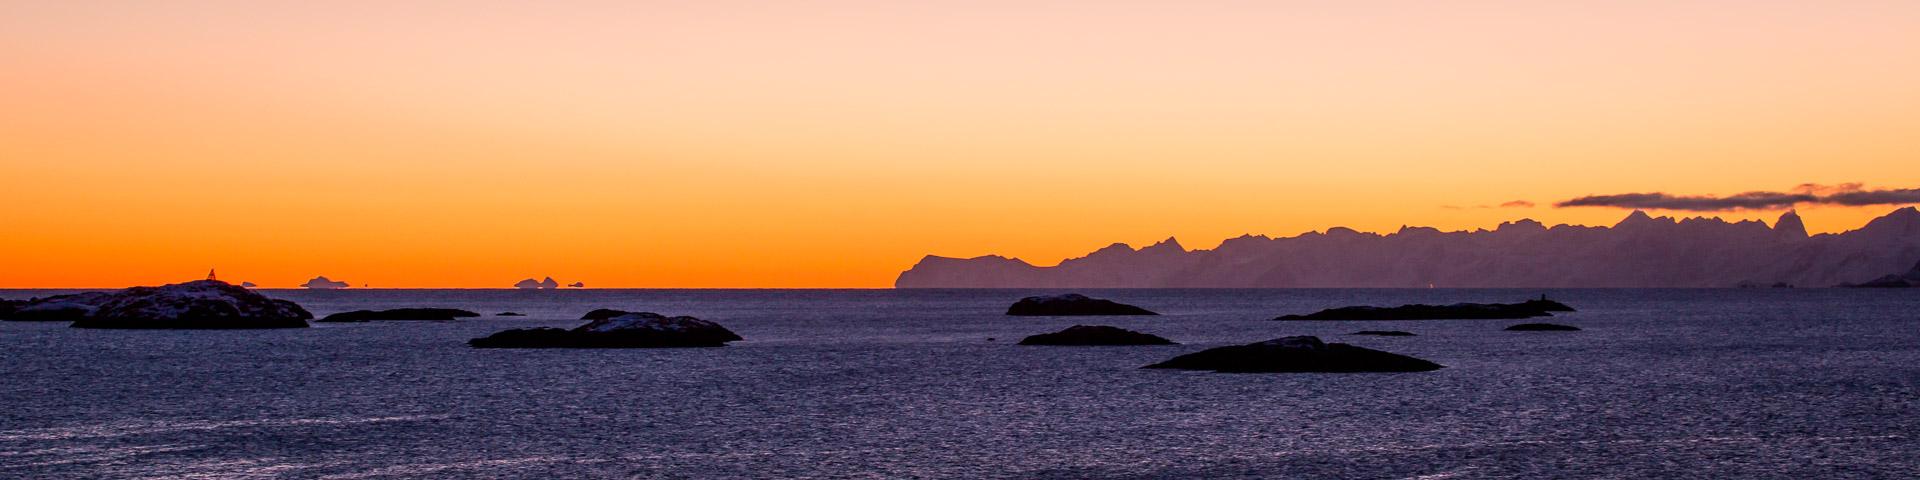 11.2. Henningsvaer - Sonnenuntergang